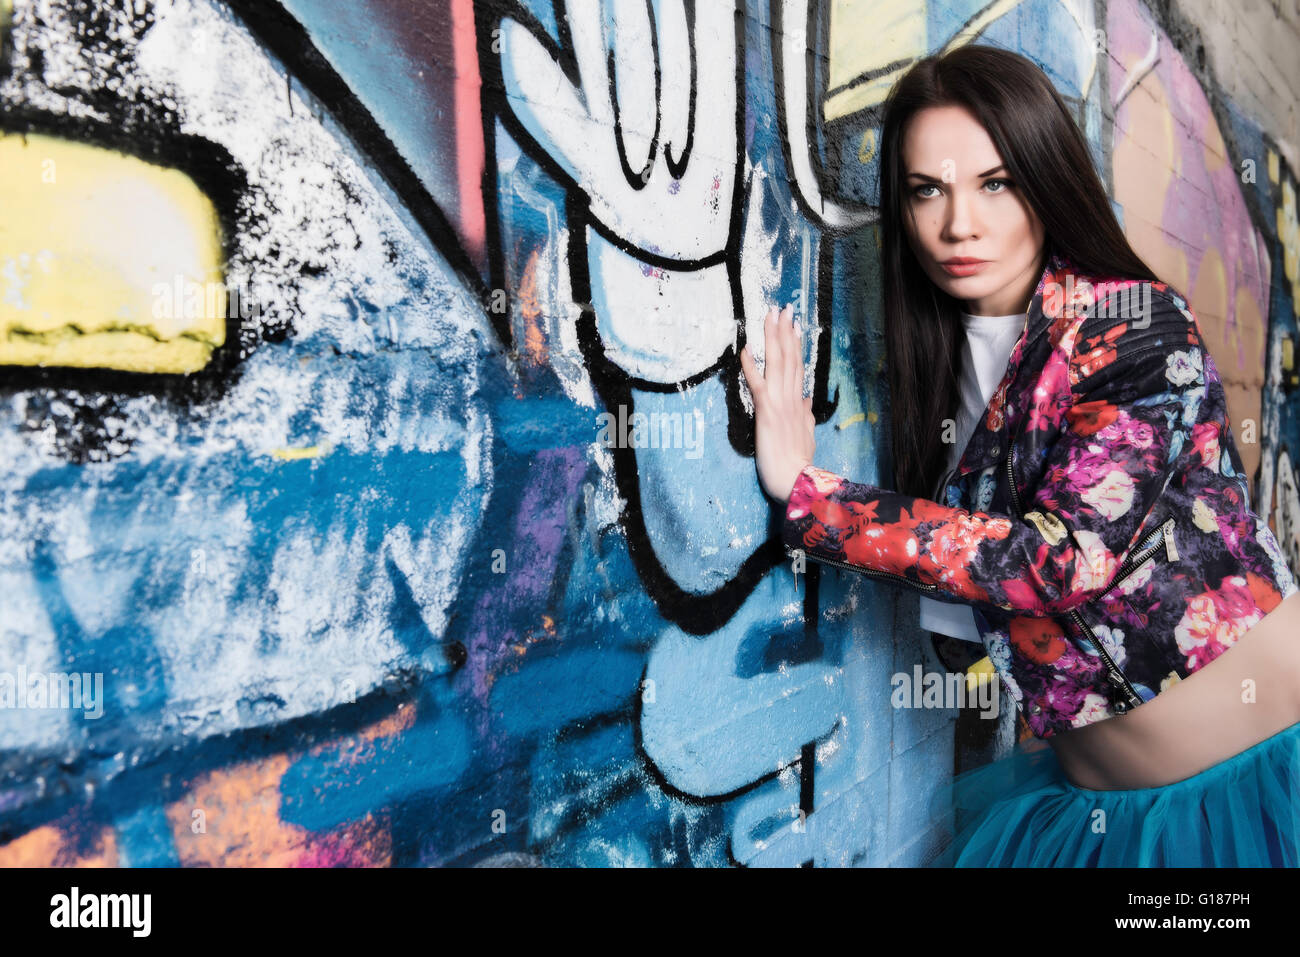 Urban Fashion Photoshoot in Salento, Apulia, model posing in